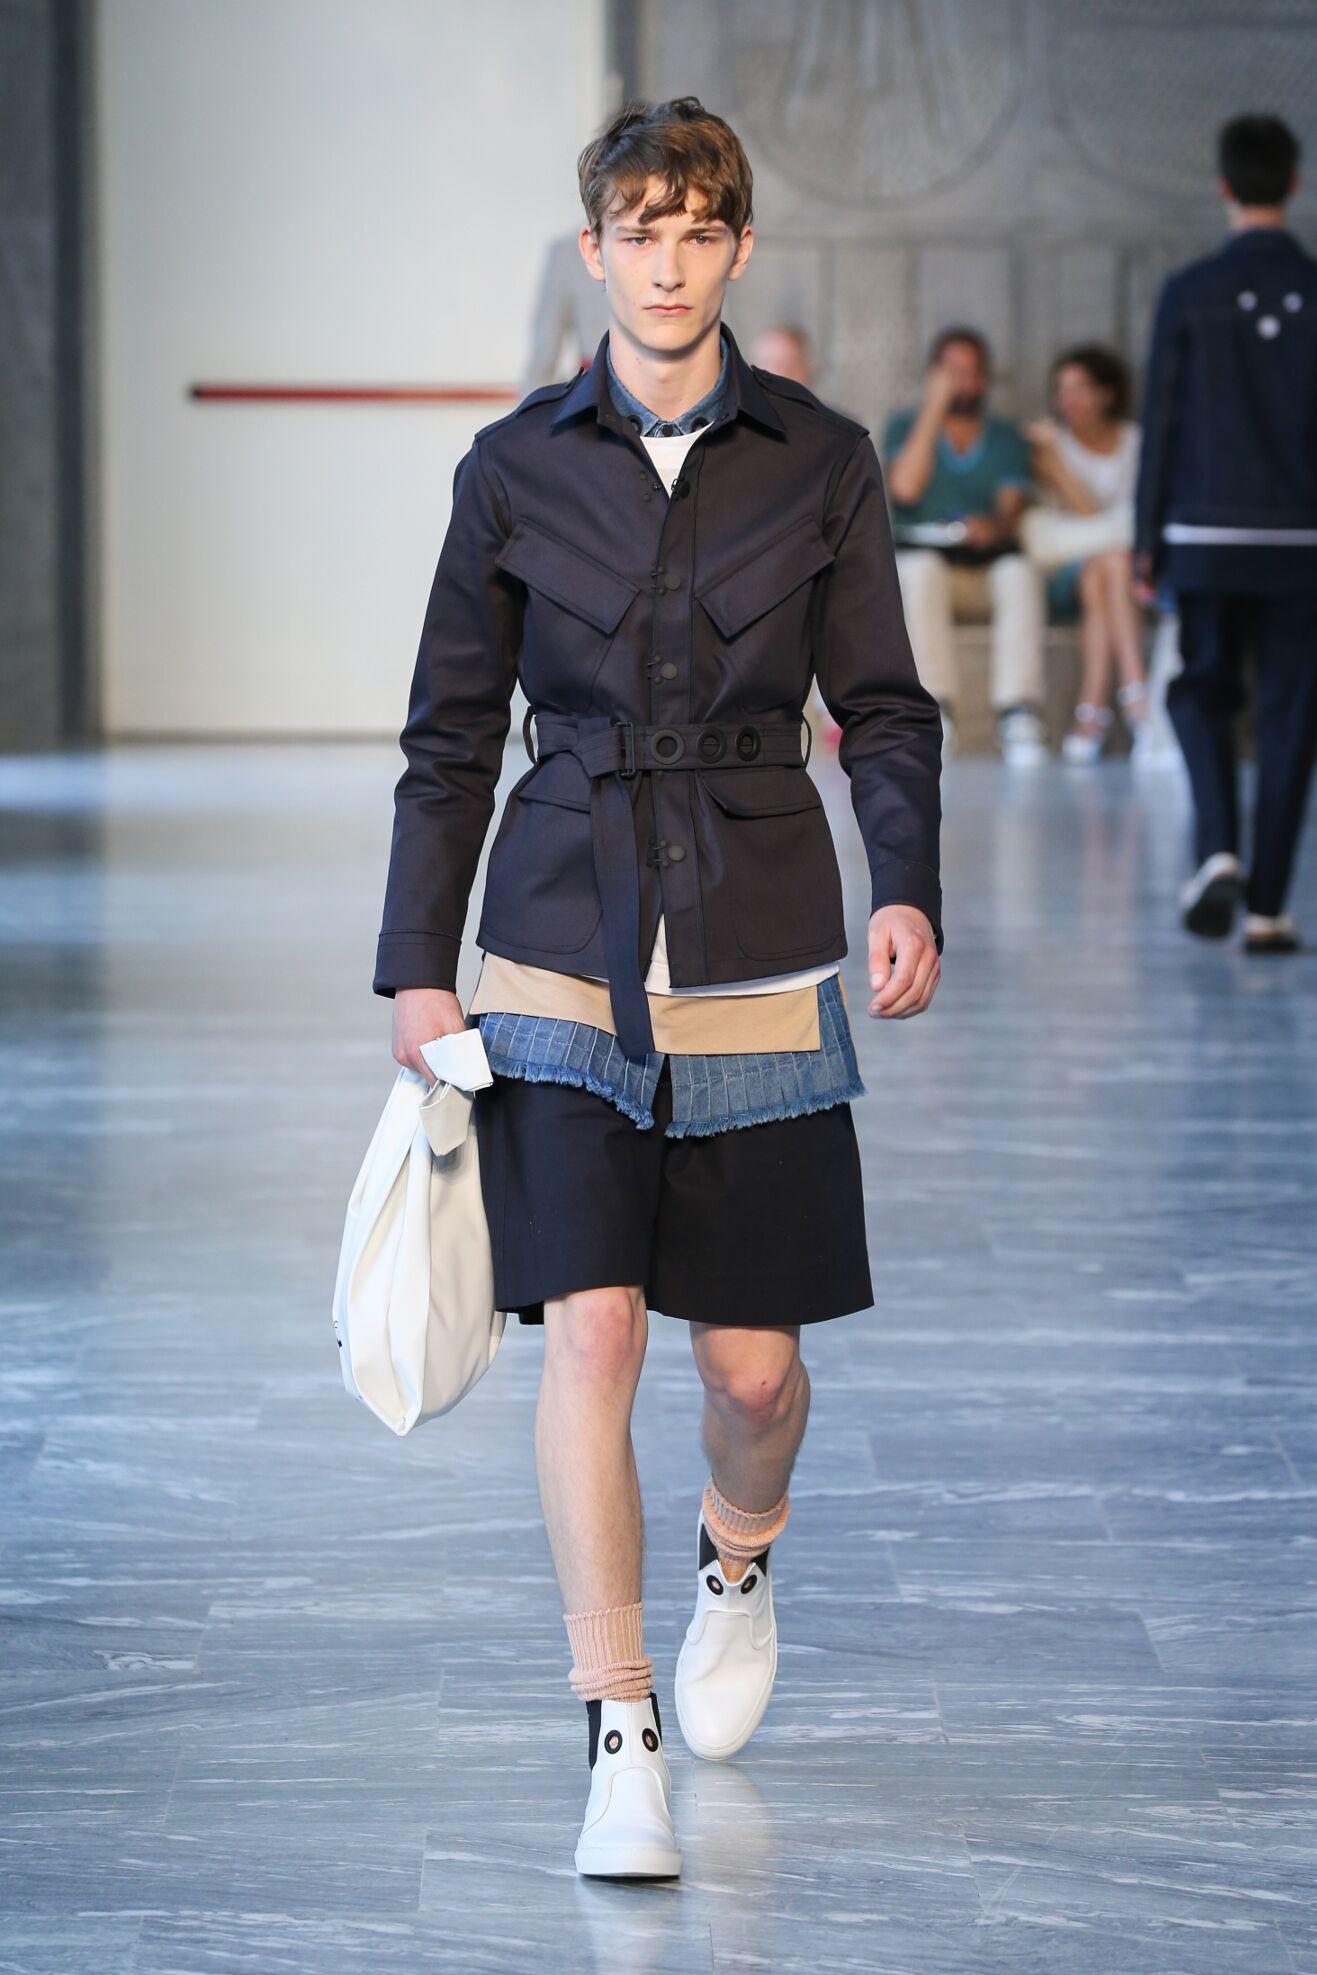 Summer 2015 Fashion Trends Andrea Pompilio